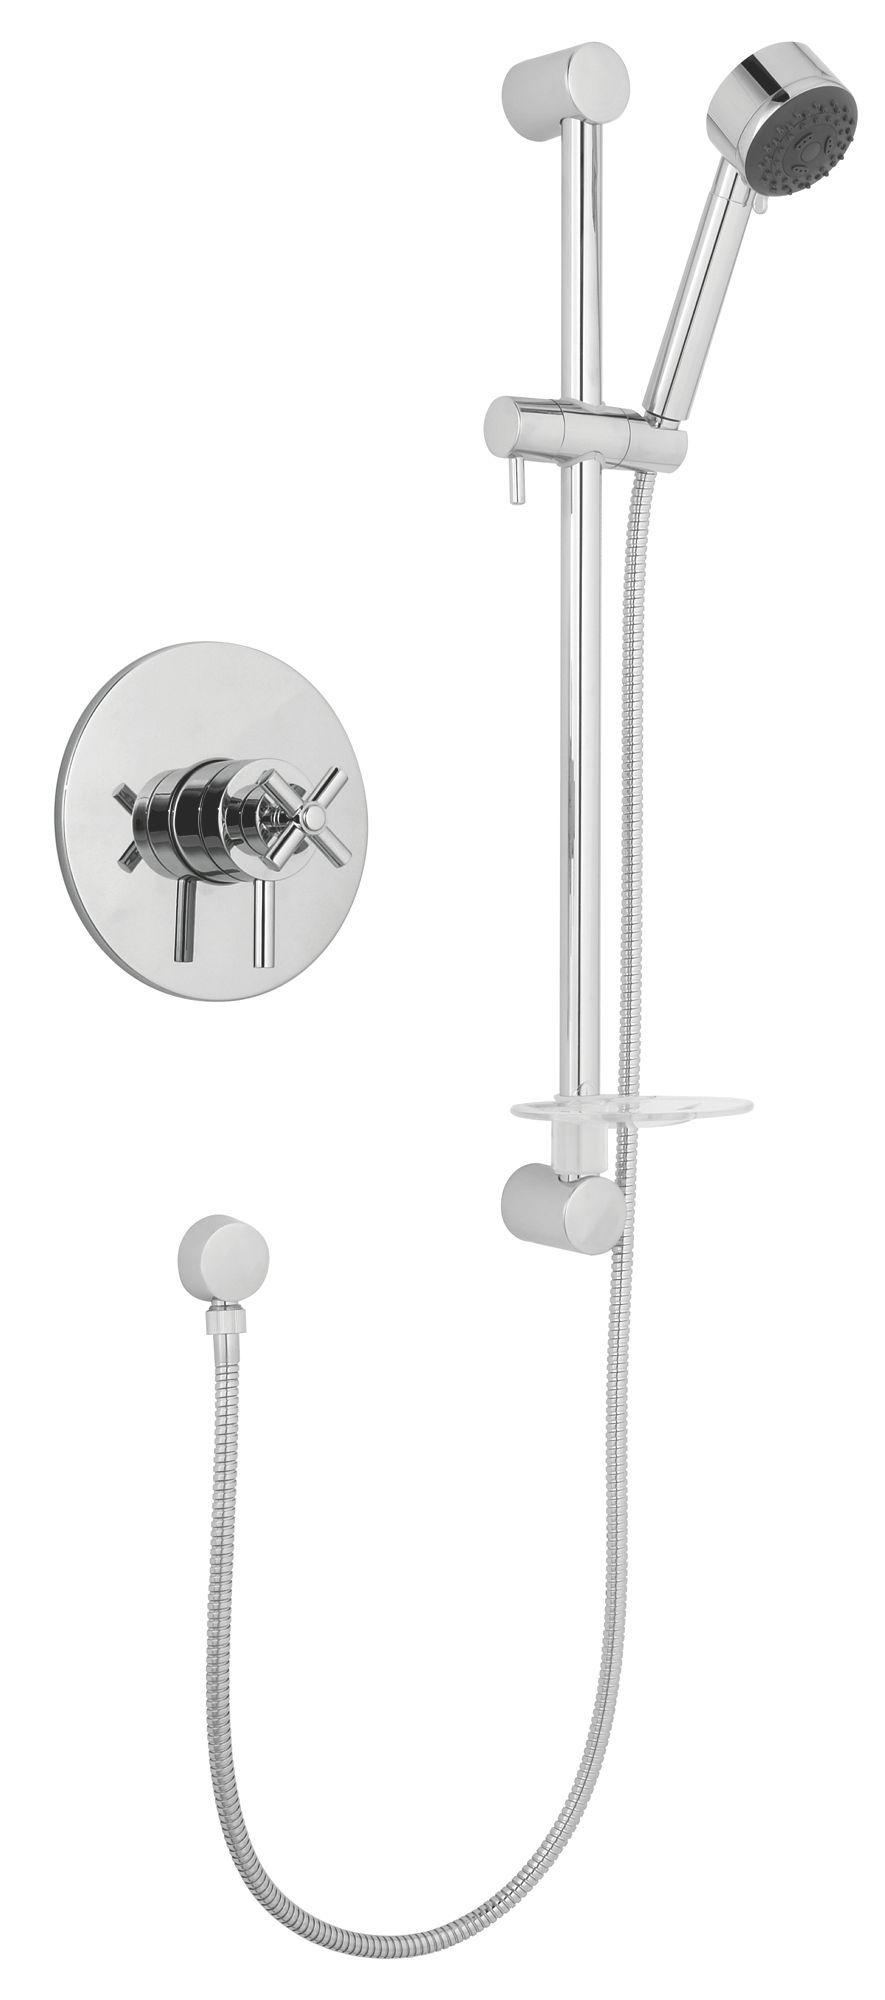 Cooke & Lewis Quattre Chrome Thermostatic Concentric Mixer Shower